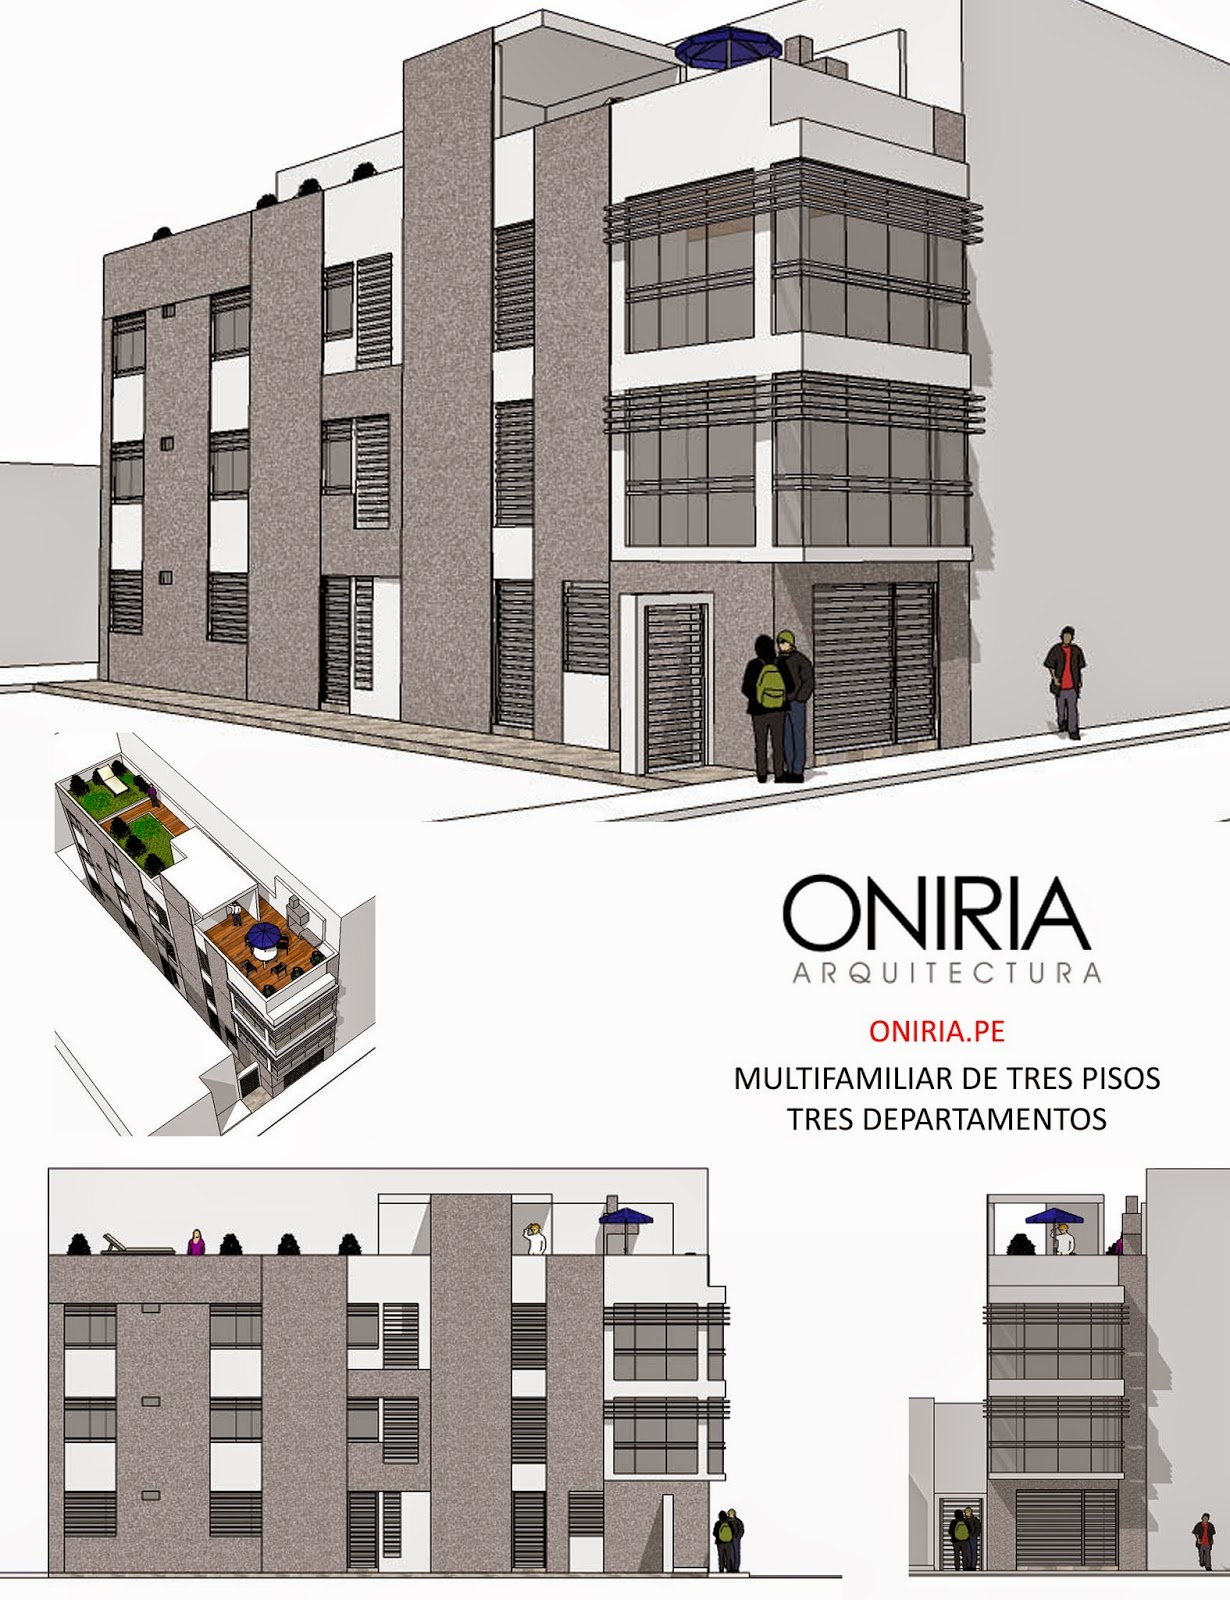 Cristian campos dise o de viviendas multifamiliares for Diseno vivienda